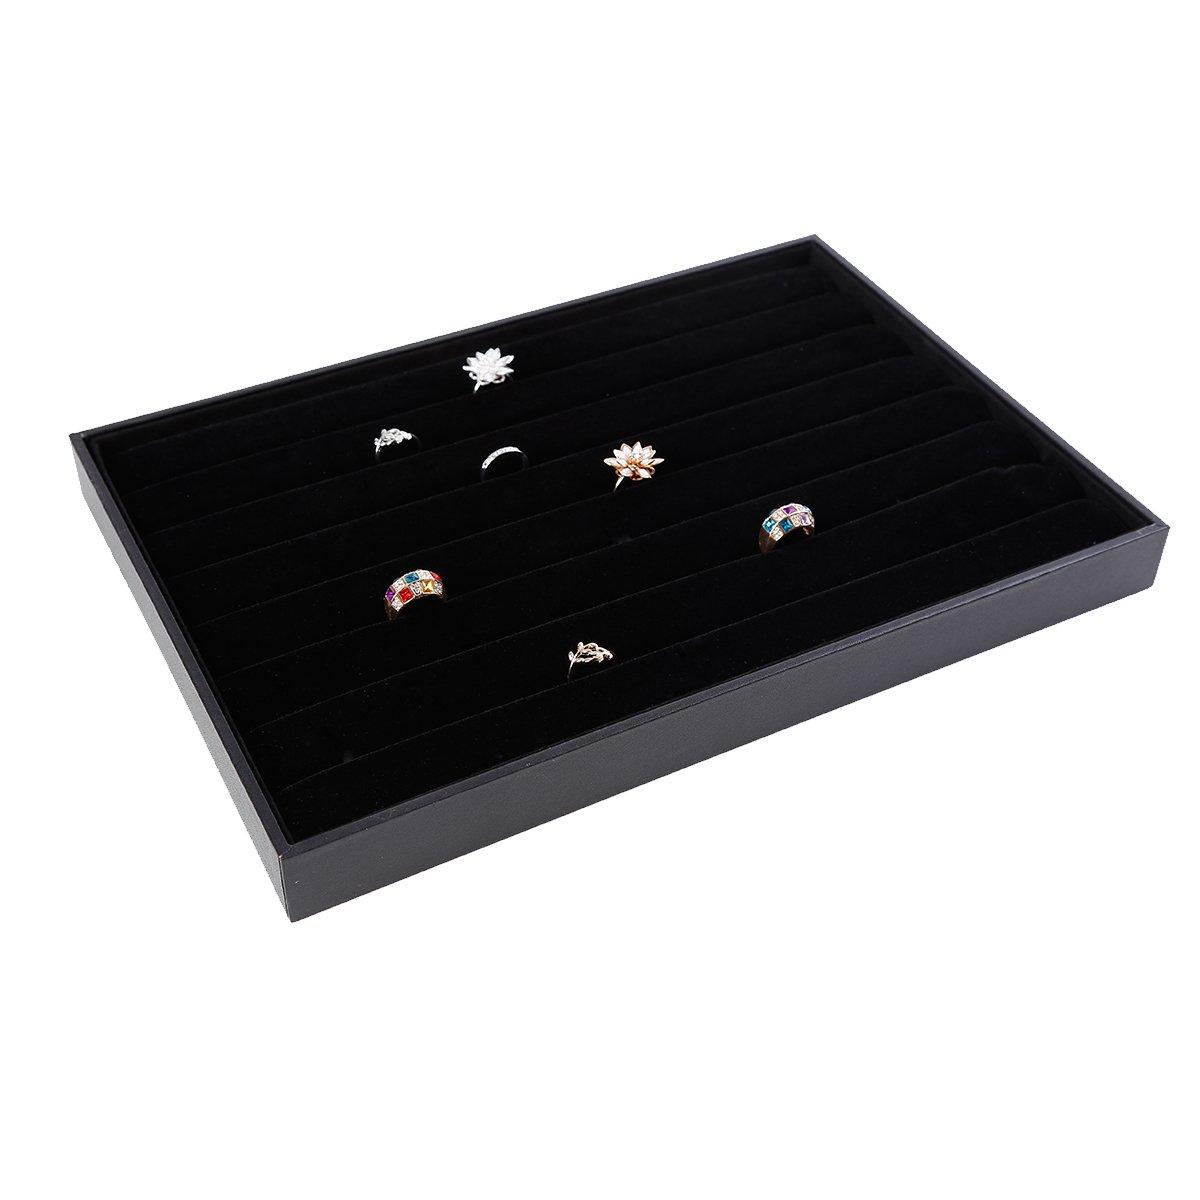 Soaptree Black Velevt Stackable 7 Slots Ring Earring Tray Showcase Display Organizer (Ring Tray)